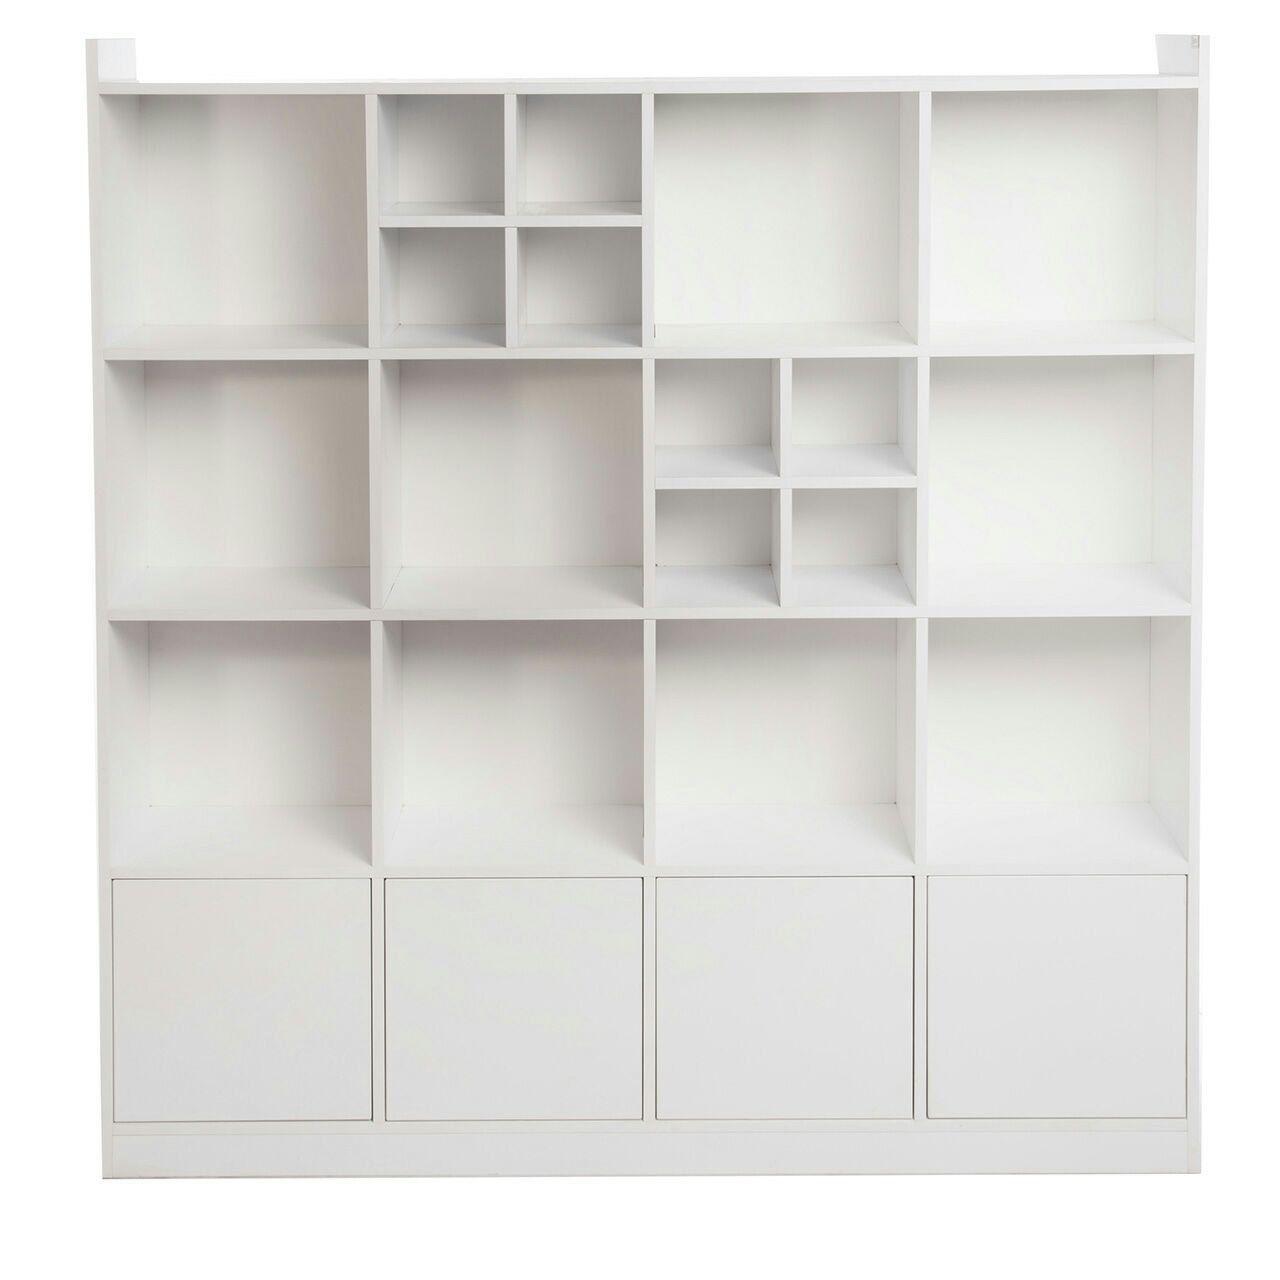 کتابخانه مدل k251